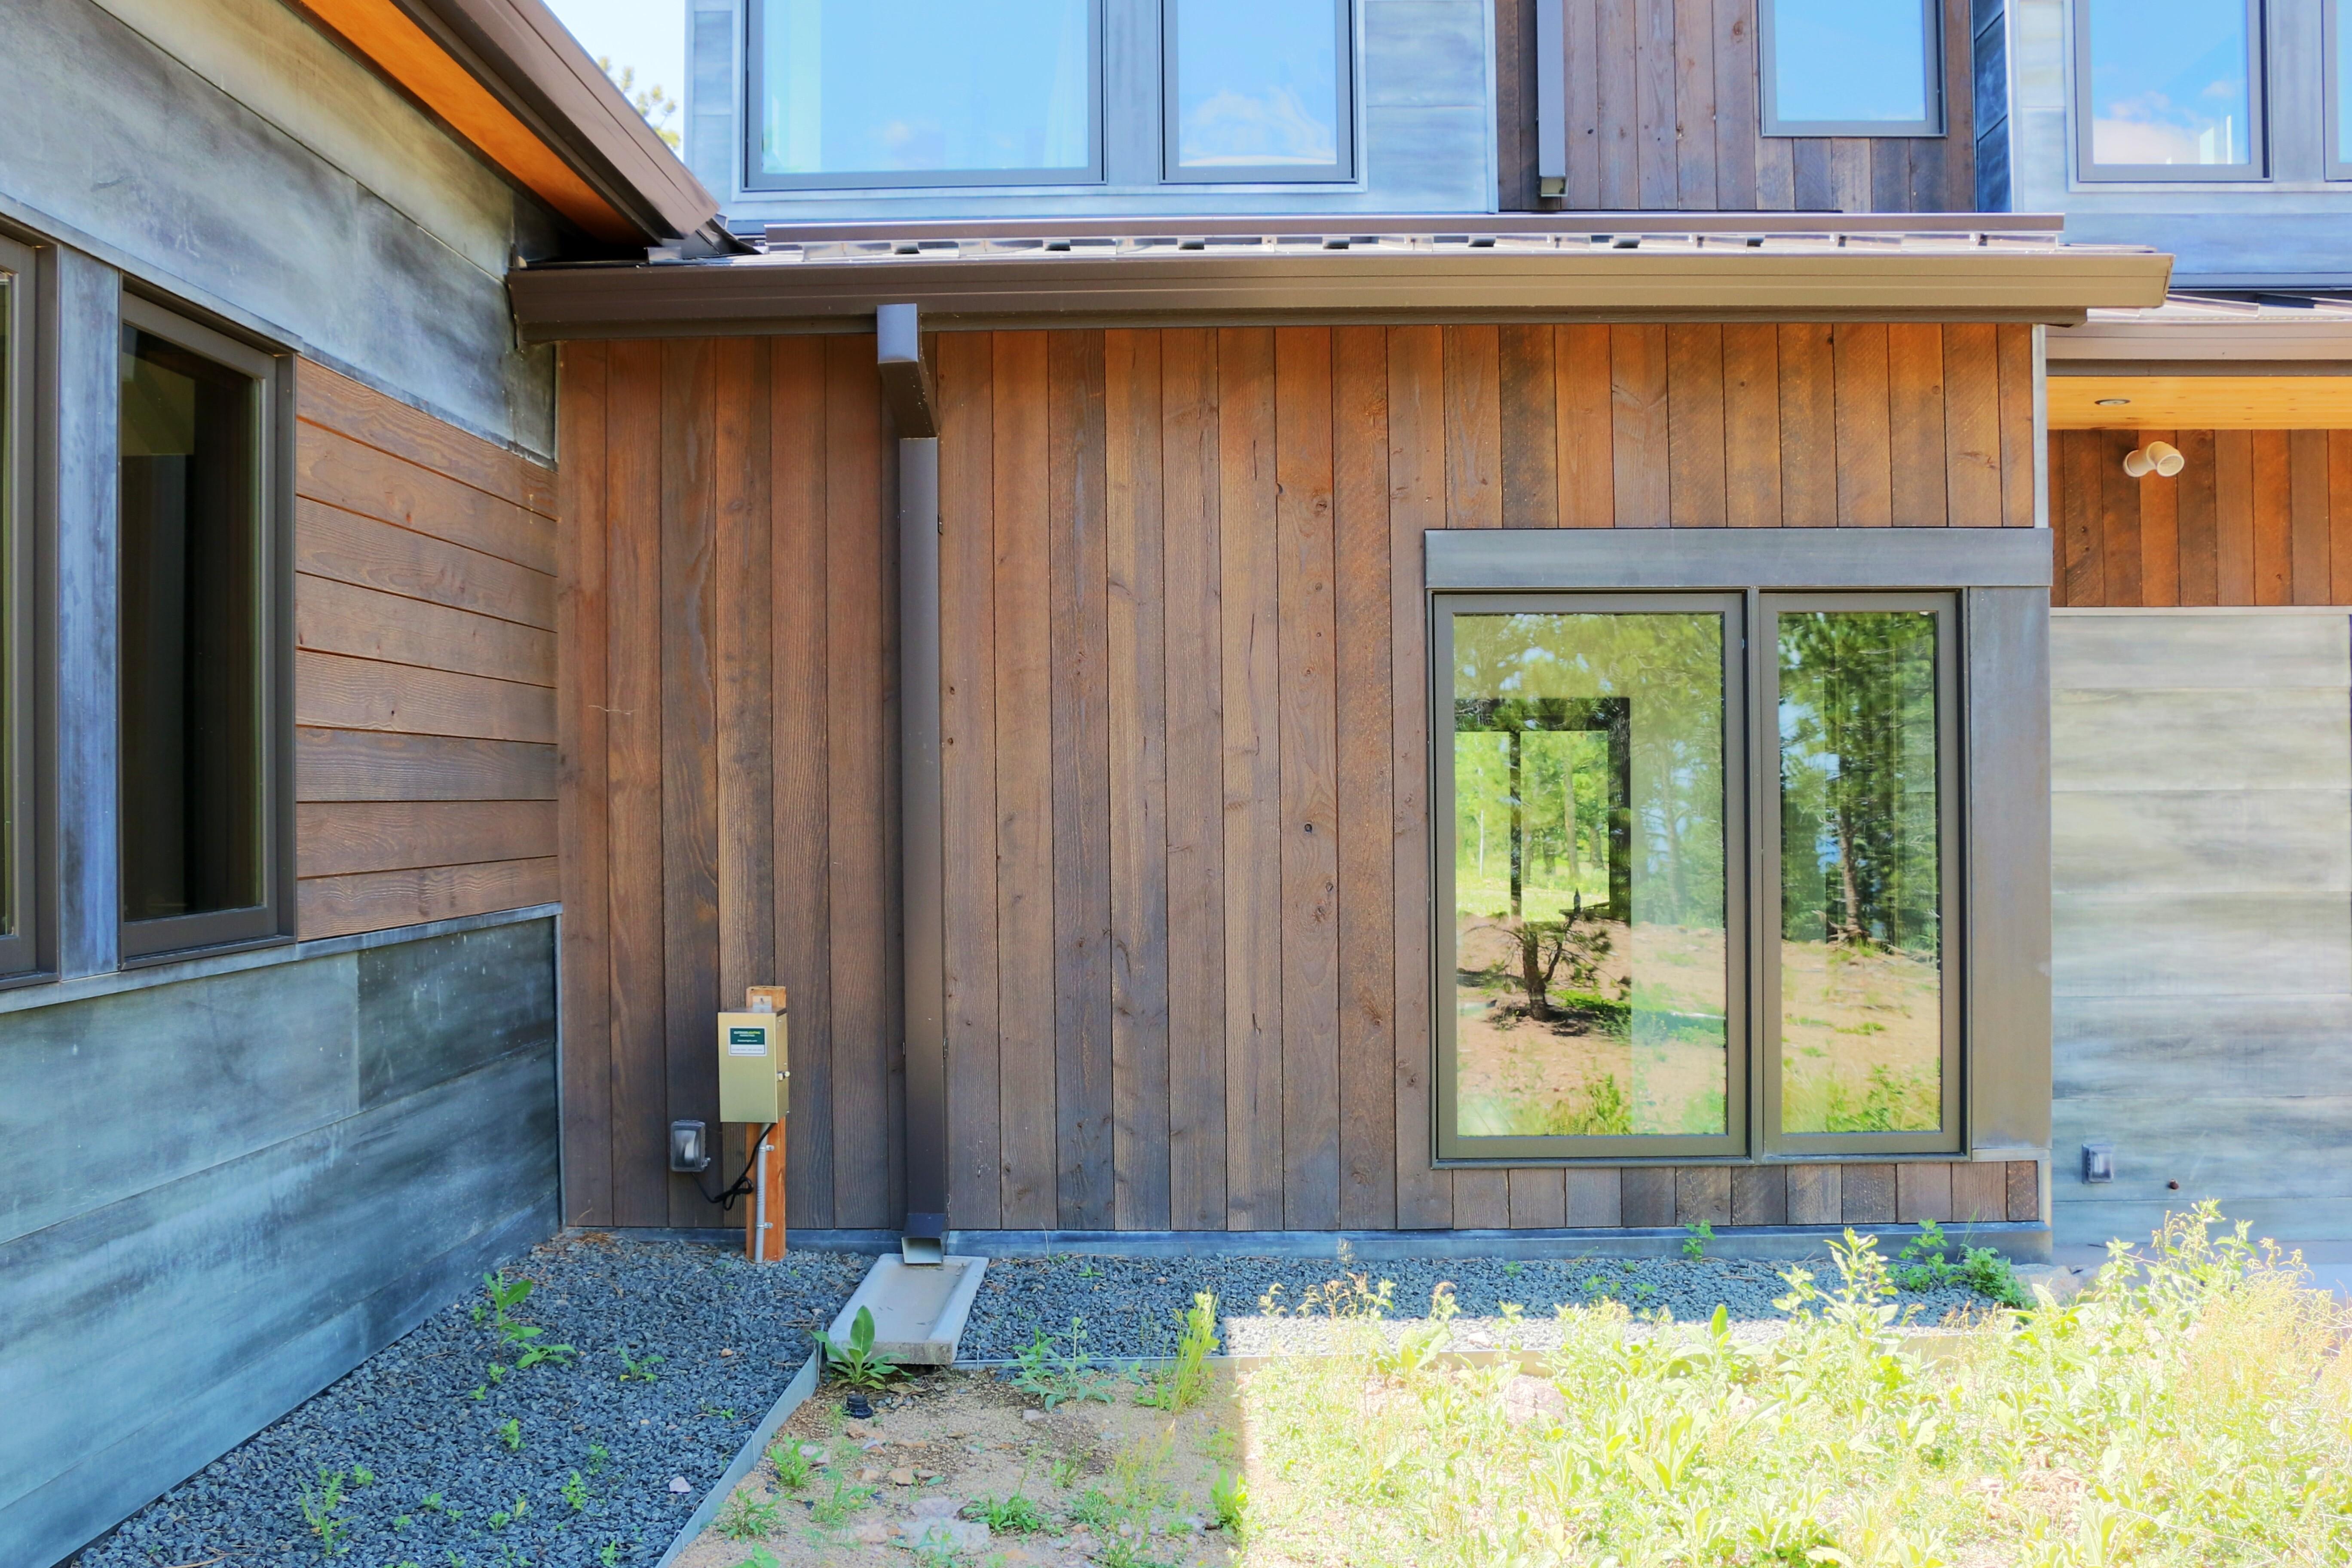 Ranchwood Shiplap Siding Montana Timber Productsmontana